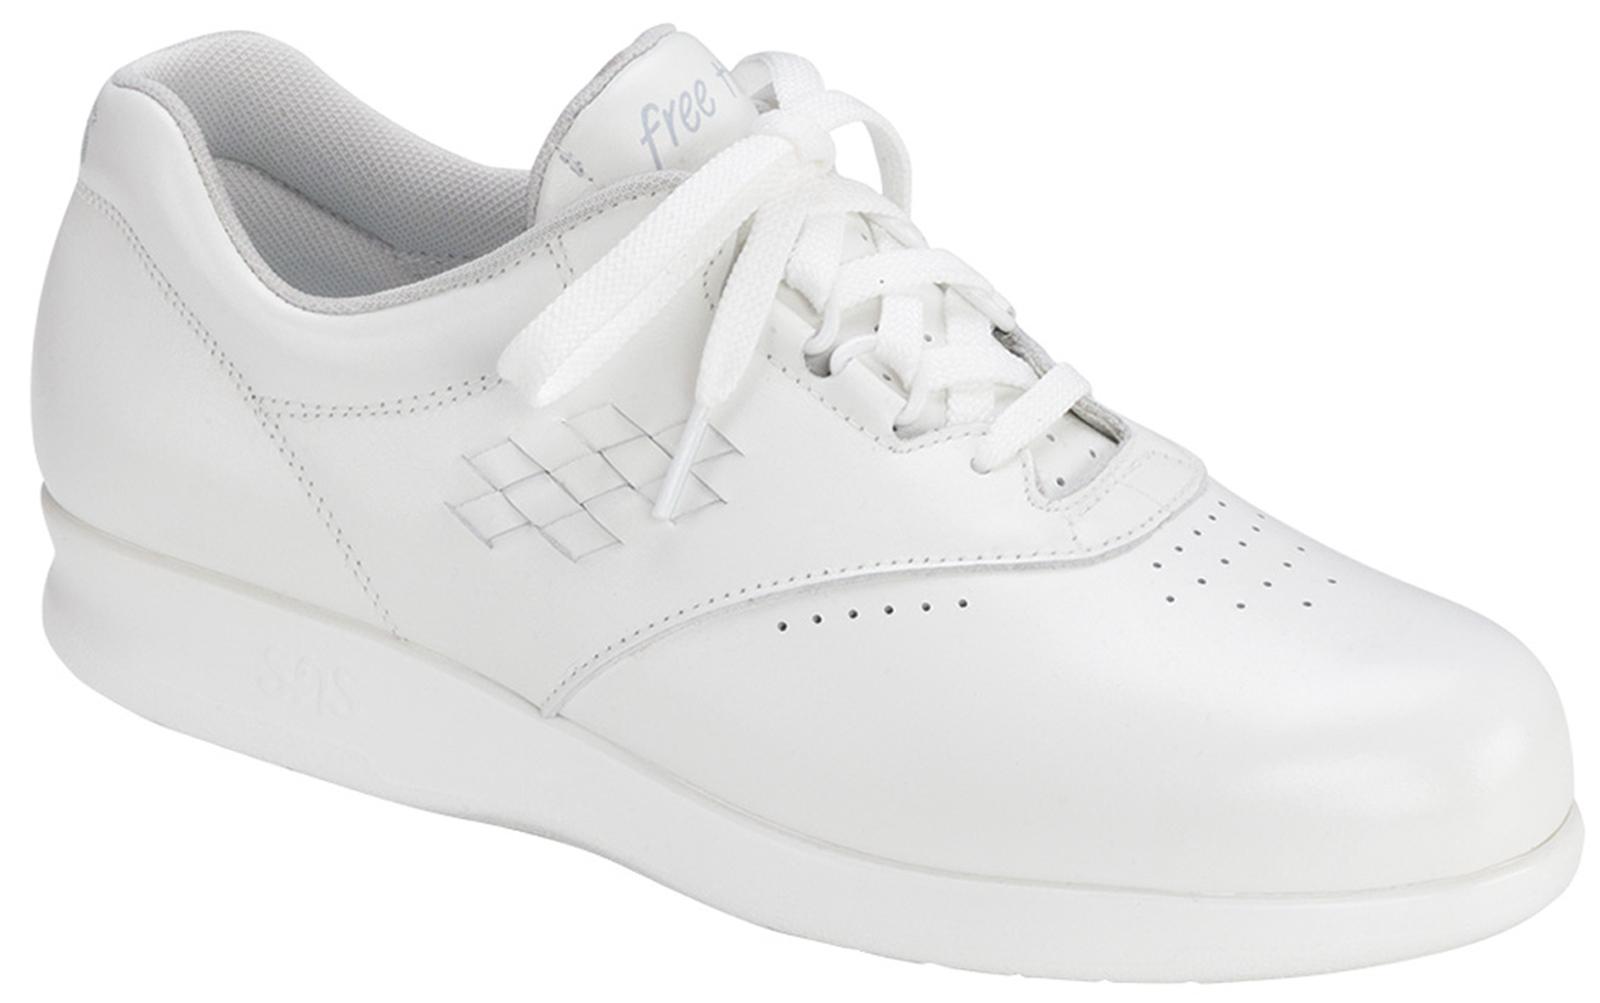 Diabetic Walking Shoe Free Time Sas Shoes D Island Slip On Driving Comfort Leather Black